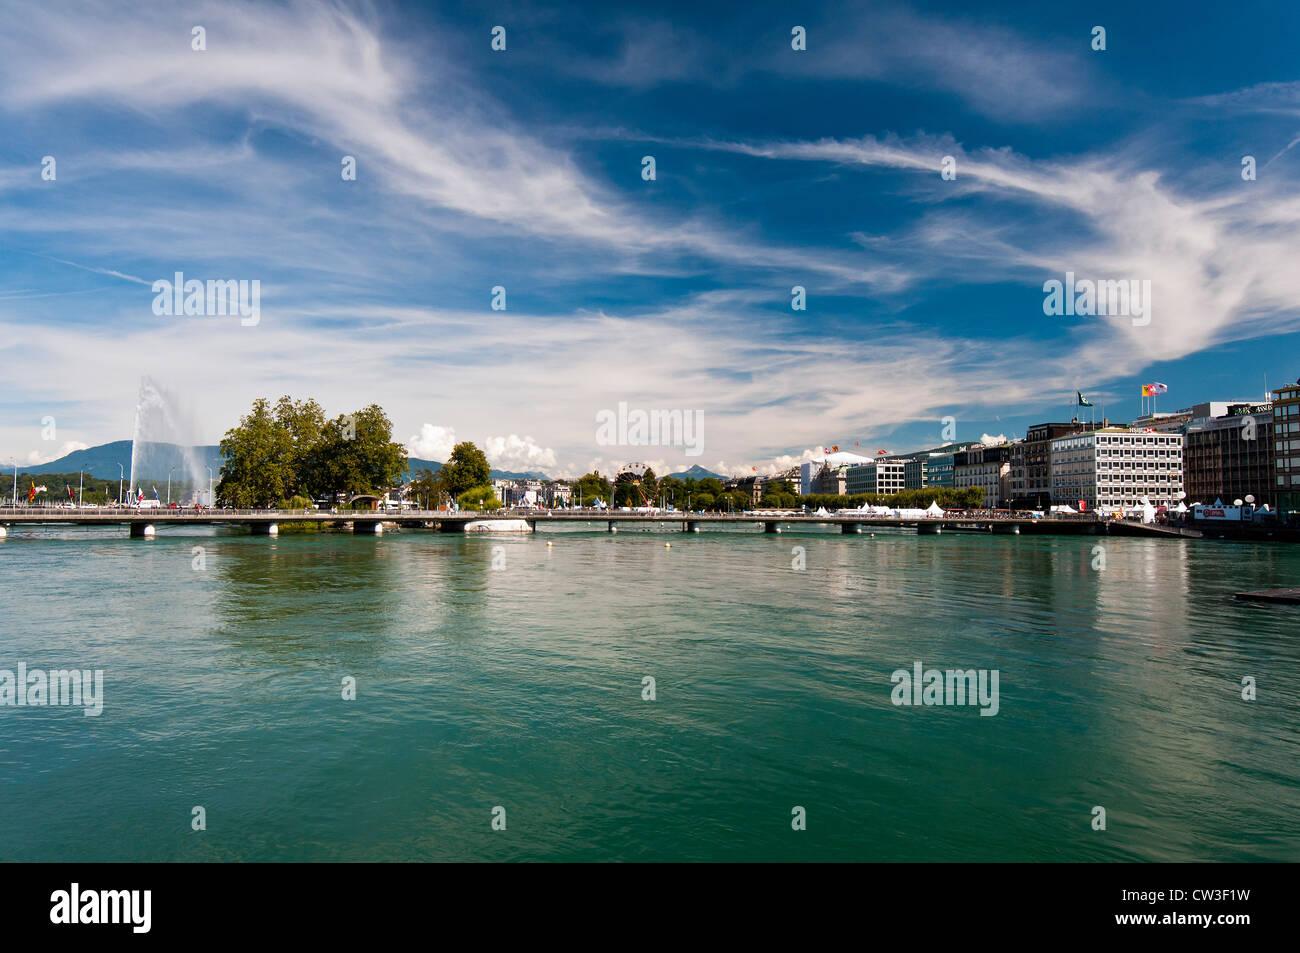 Panoramic view of Geneva, Switzerland with Jet d'Eau fountain - Stock Image